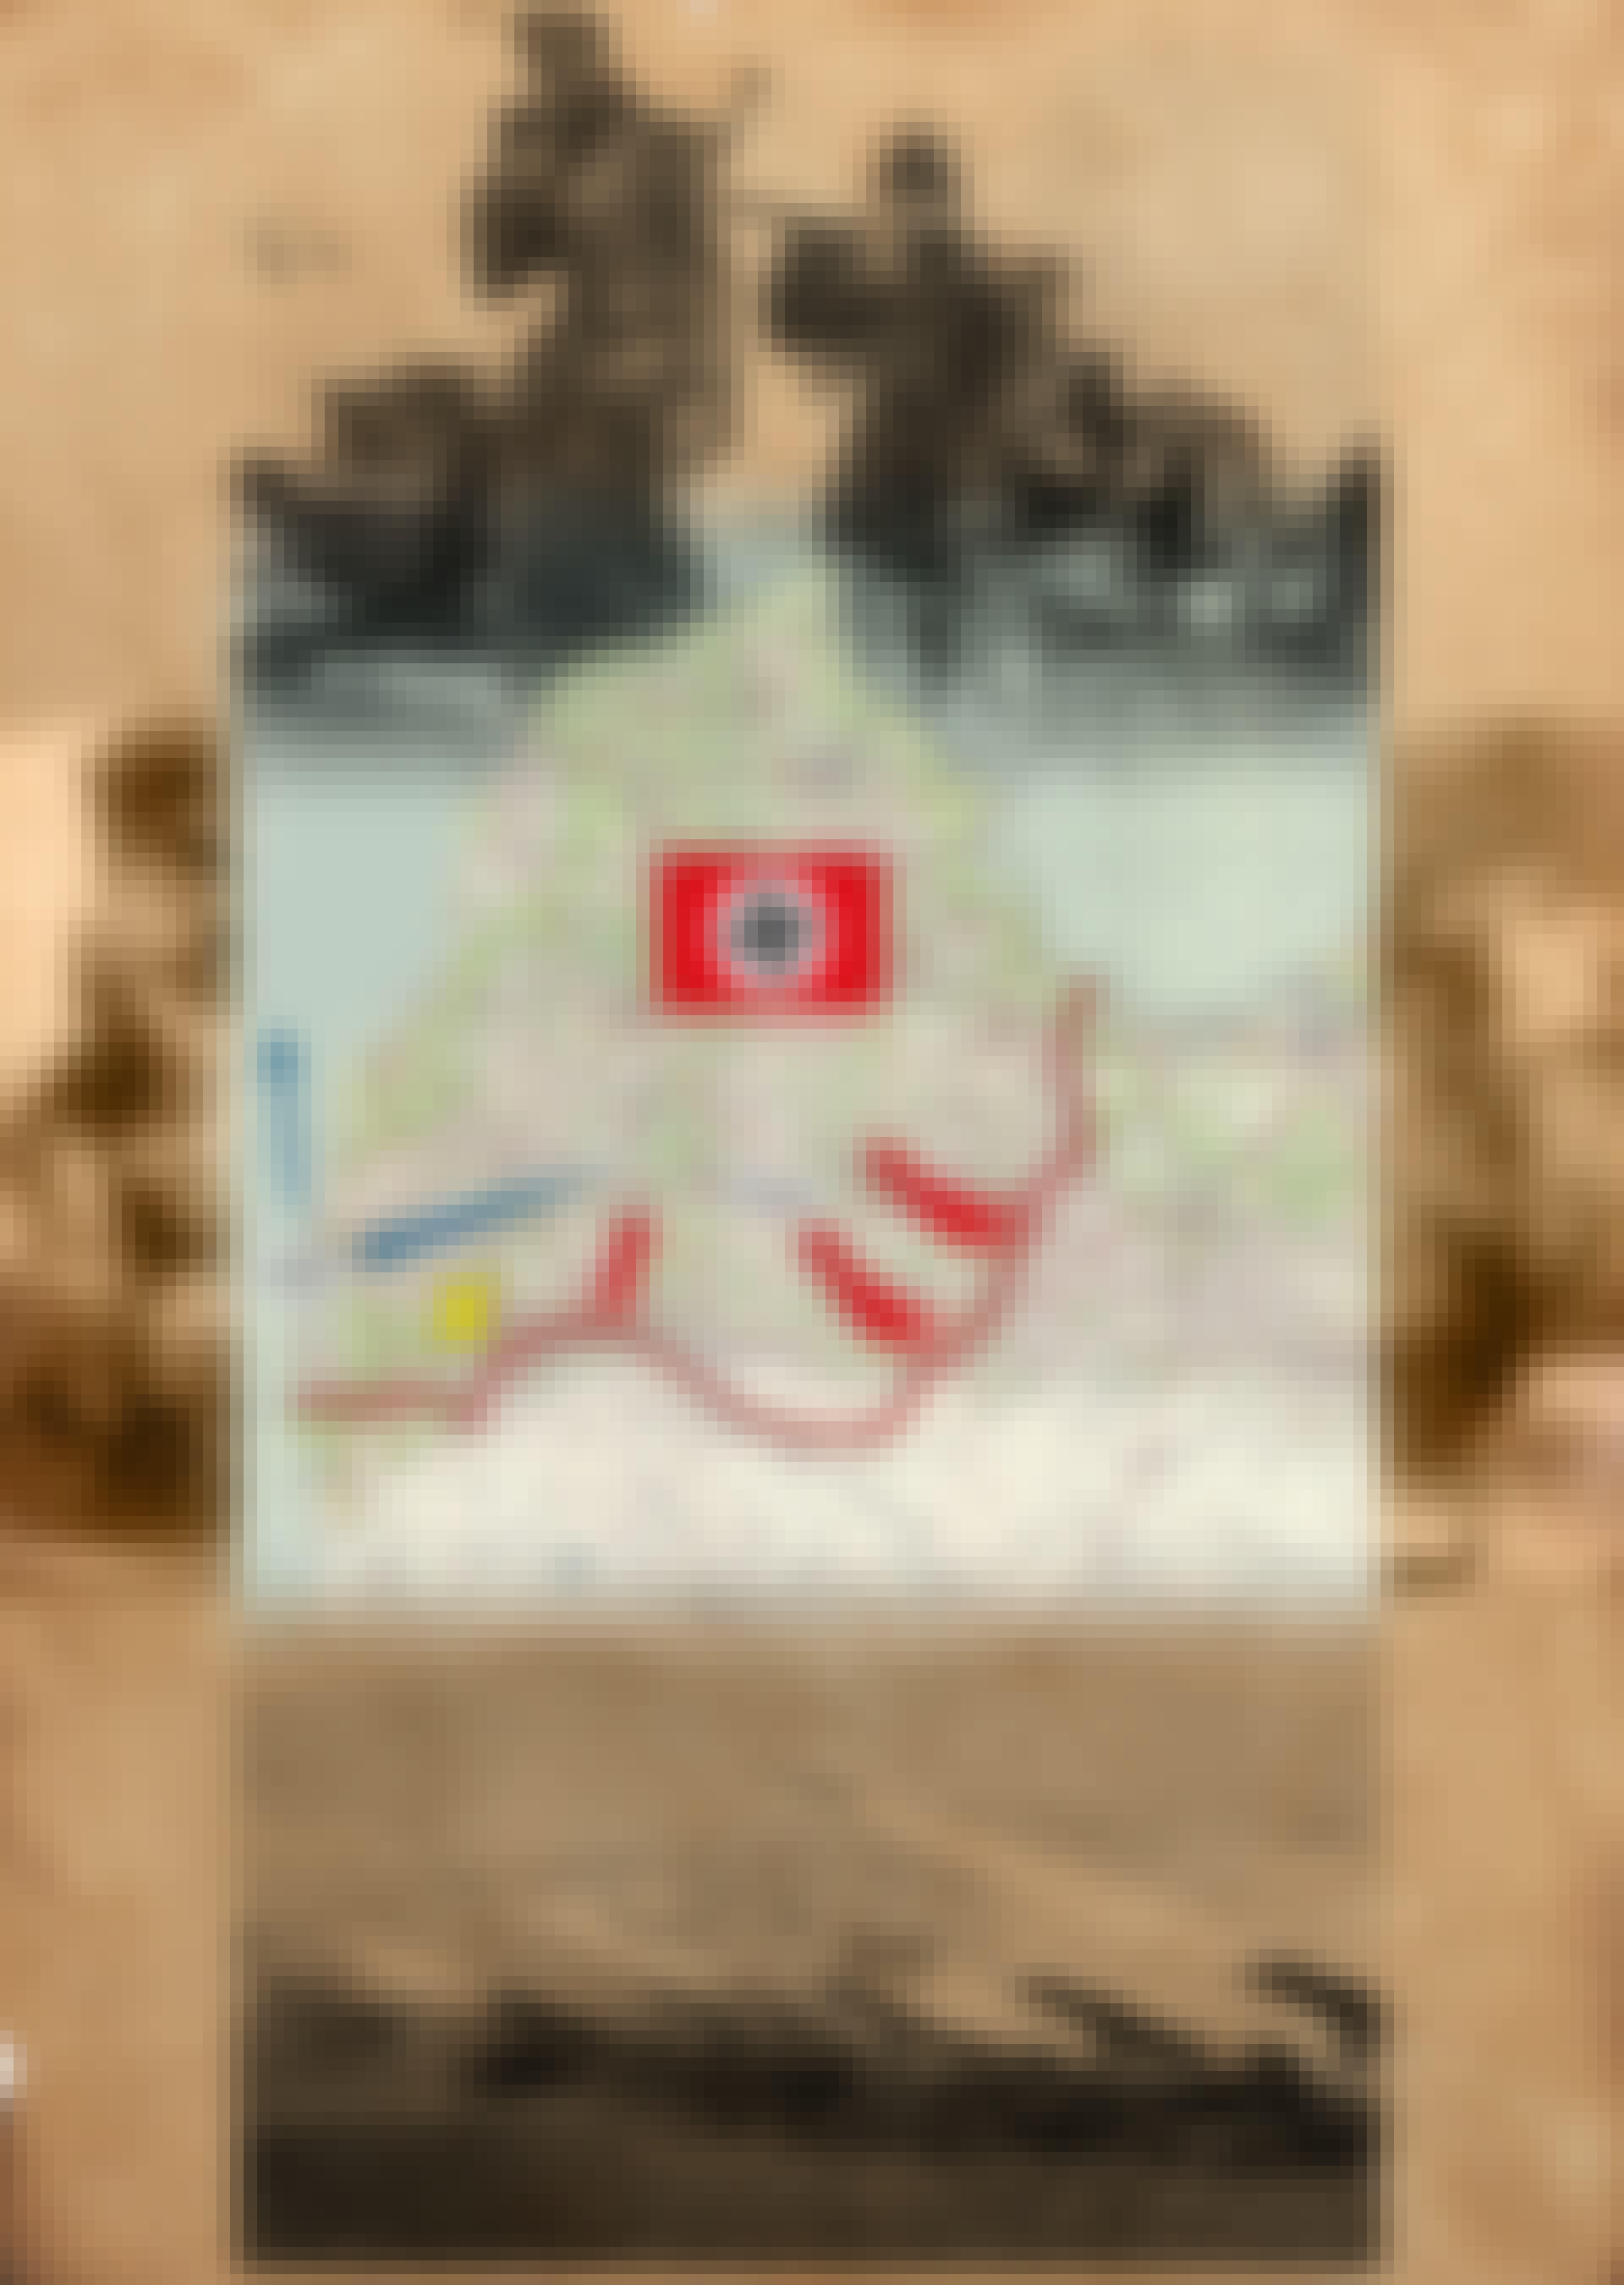 Kurland, 2 verdskrig